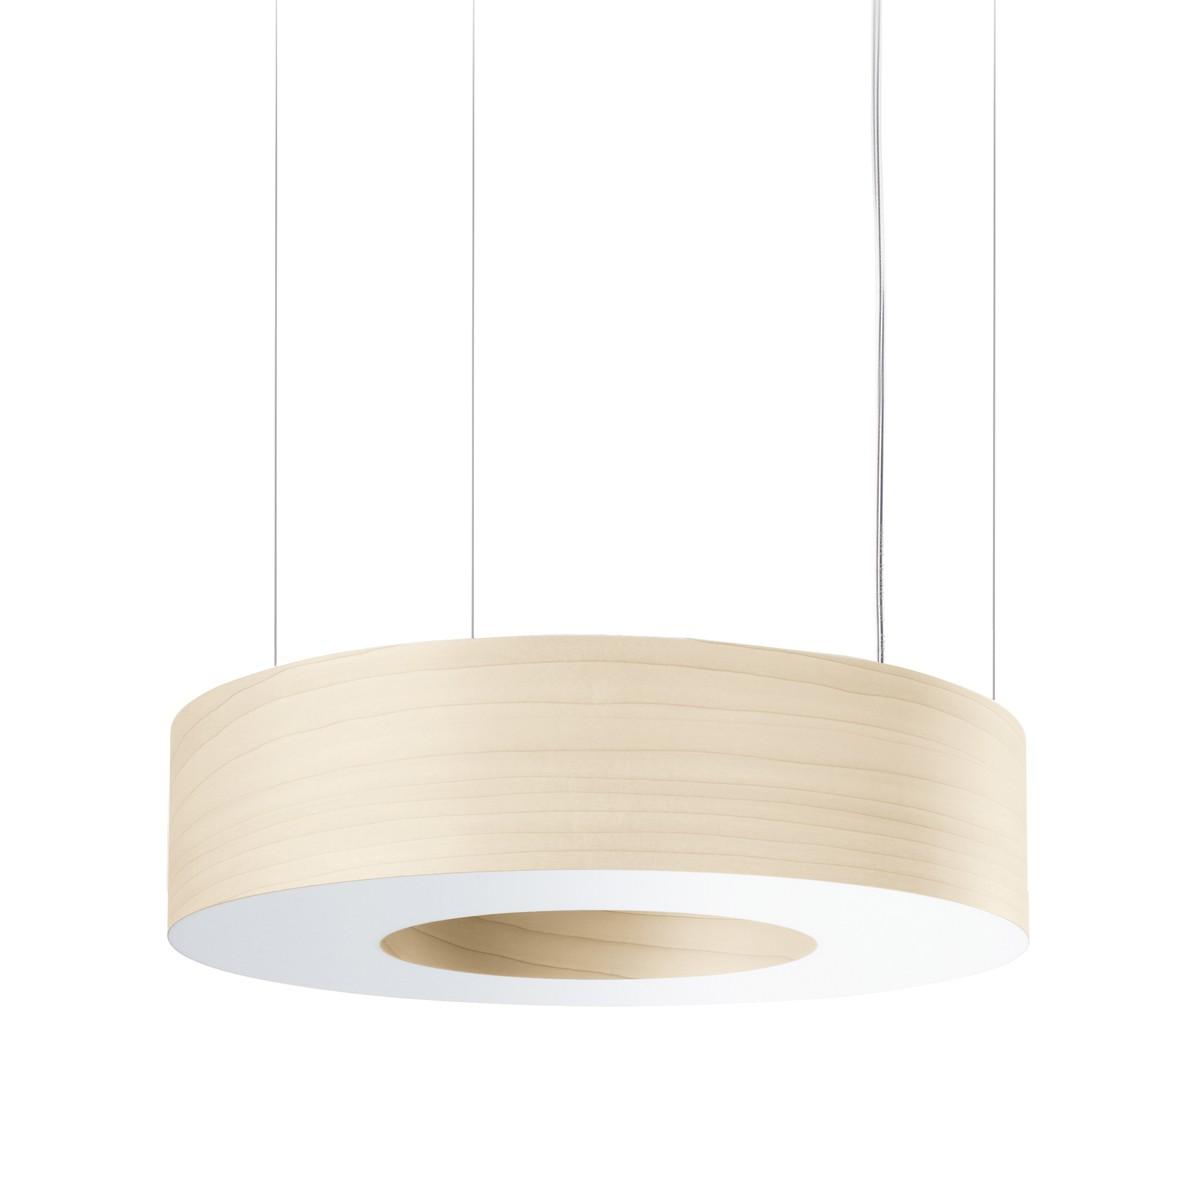 LZF Lamps Saturnia Medium LED Pendelleuchte, elfenbeinweiß